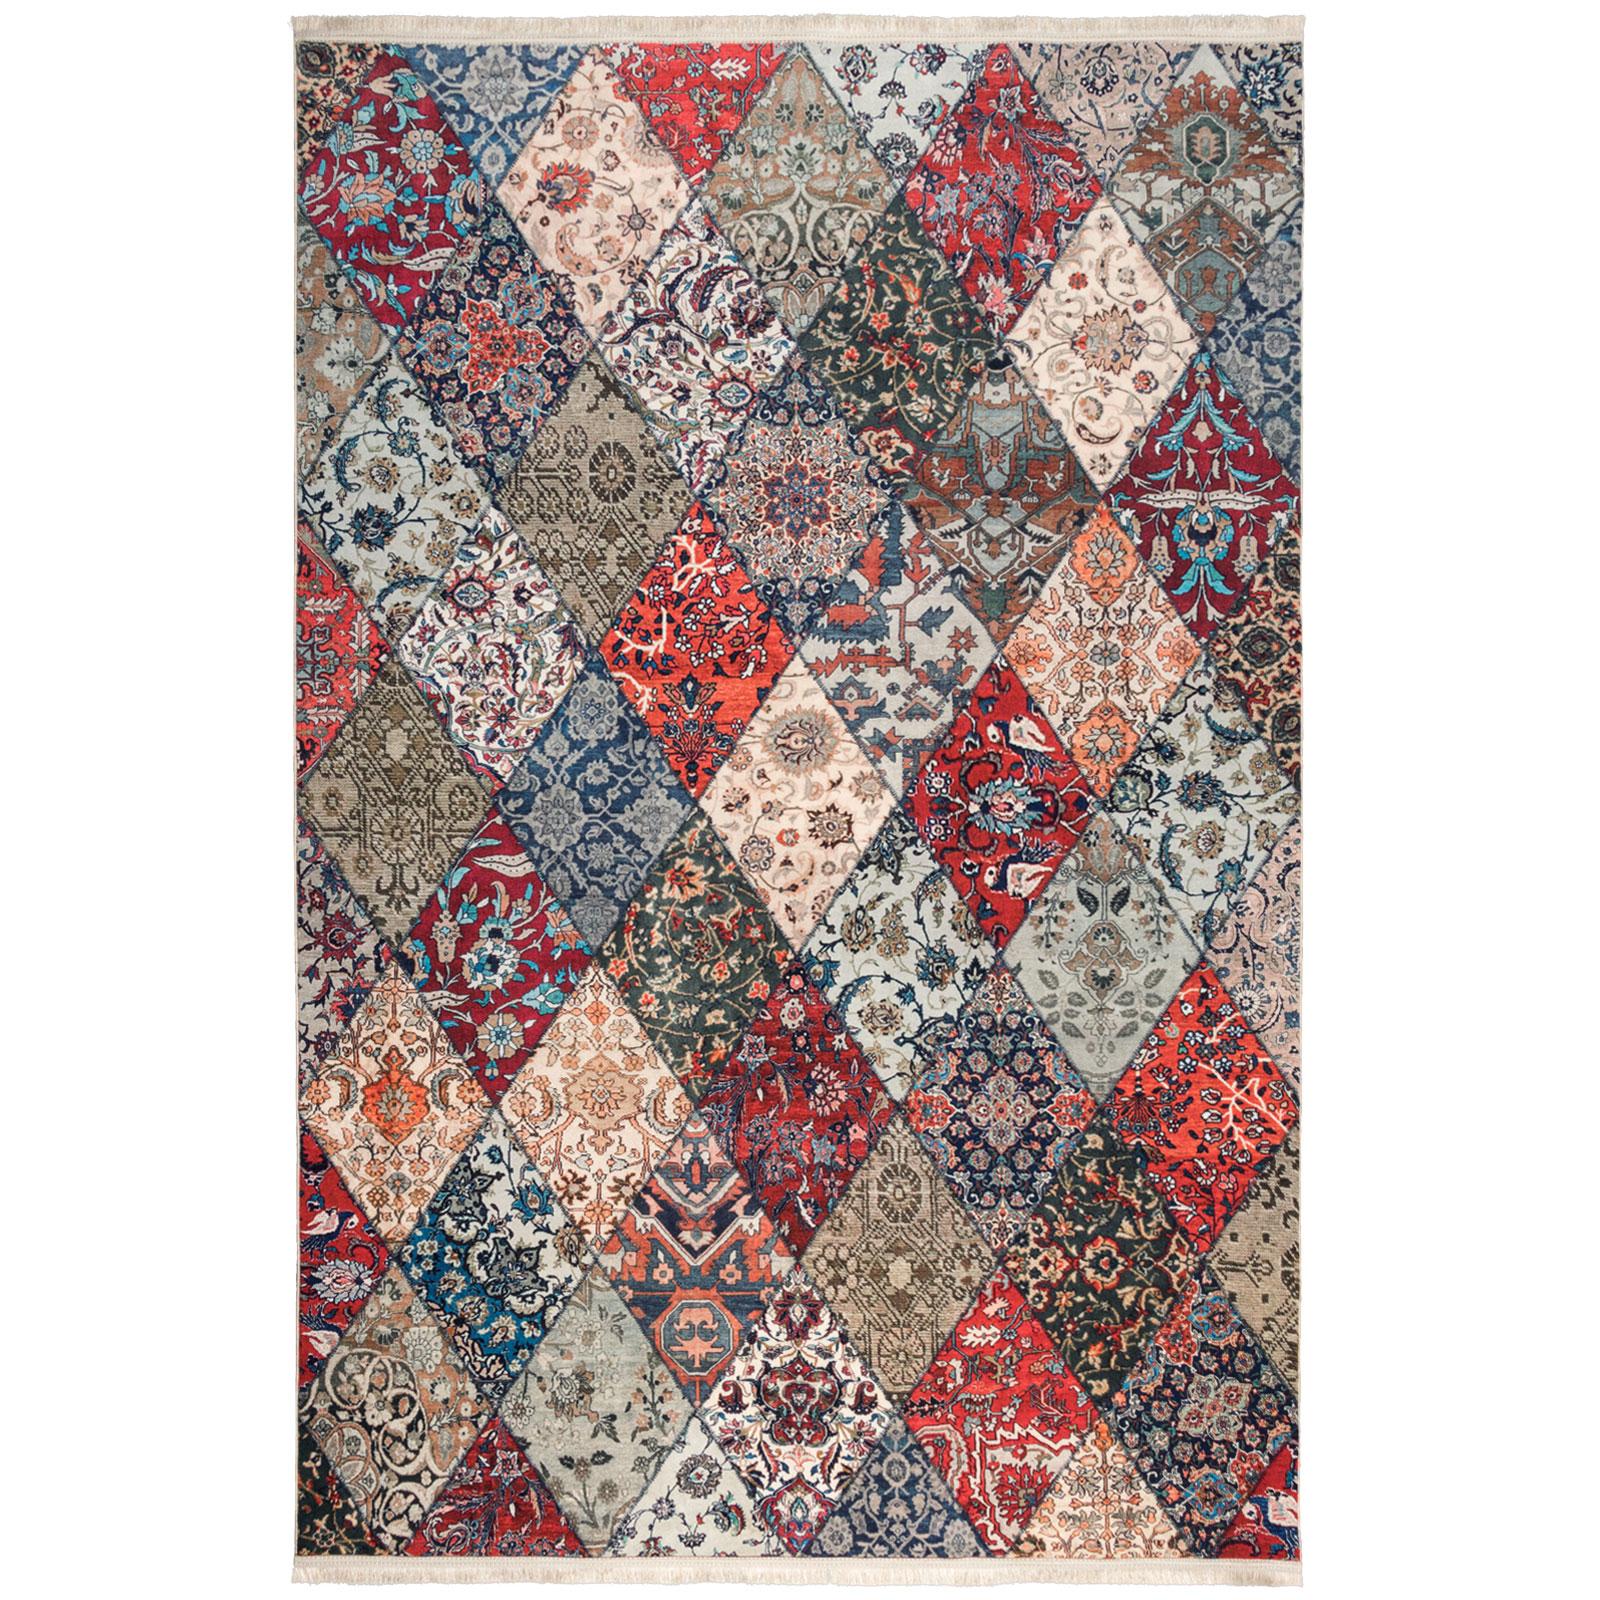 فرش ماشینی محتشم طرح چهل تکه کد 100509 زمینه لاکی